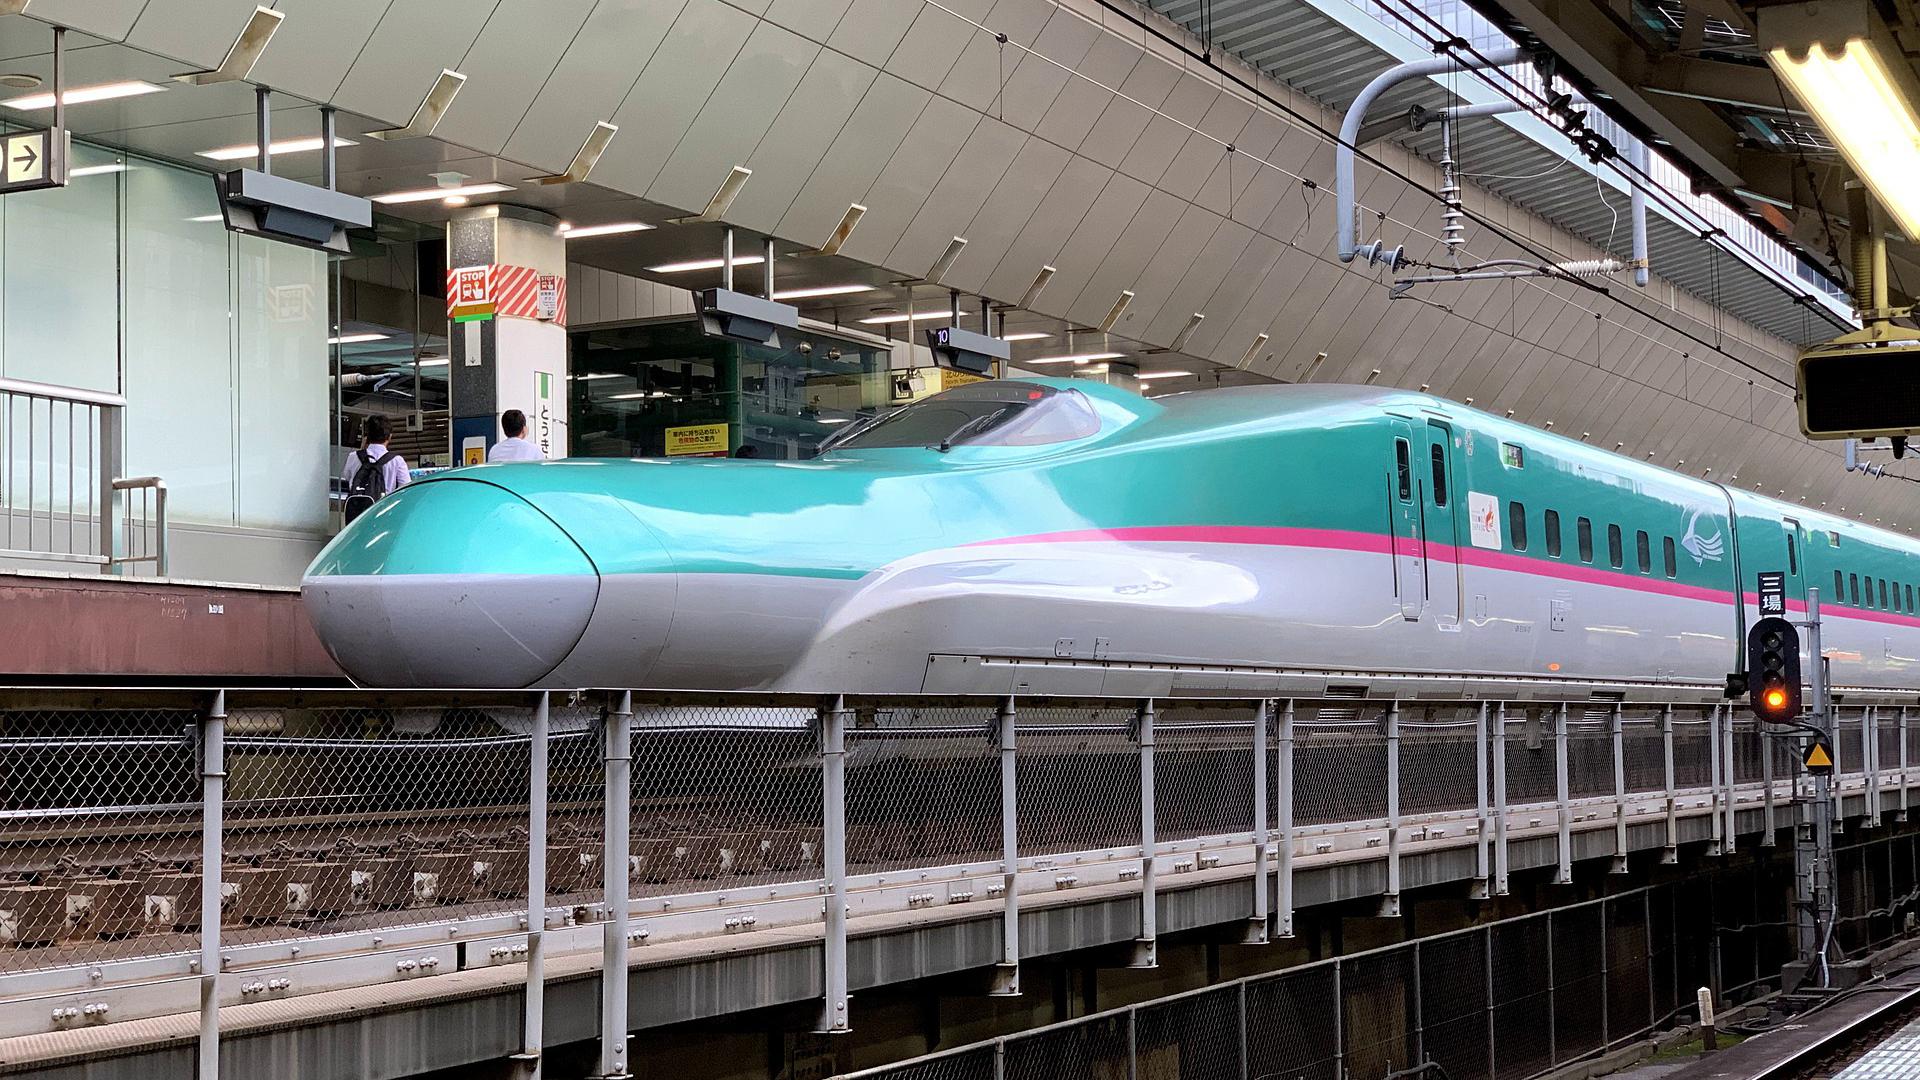 JR East shinkansen tickets are now half price until March 2021